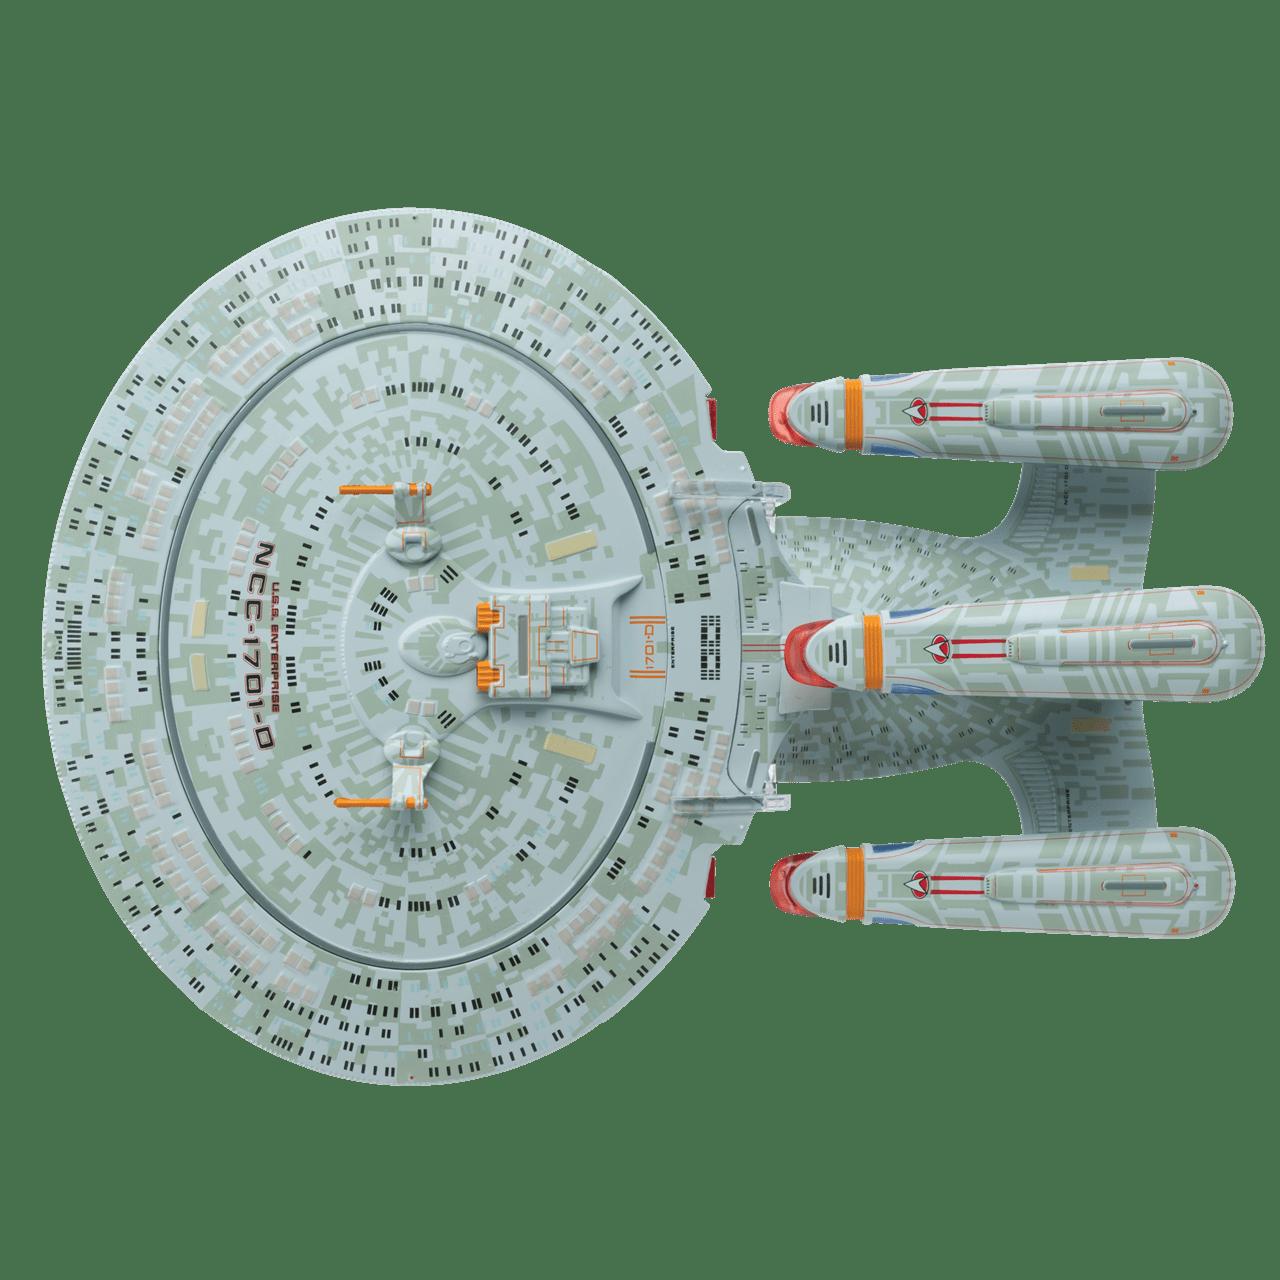 Star Trek: U.S.S. Enterprise NCC-1701-D Dreadnought Ship XL Hero Collector - 2